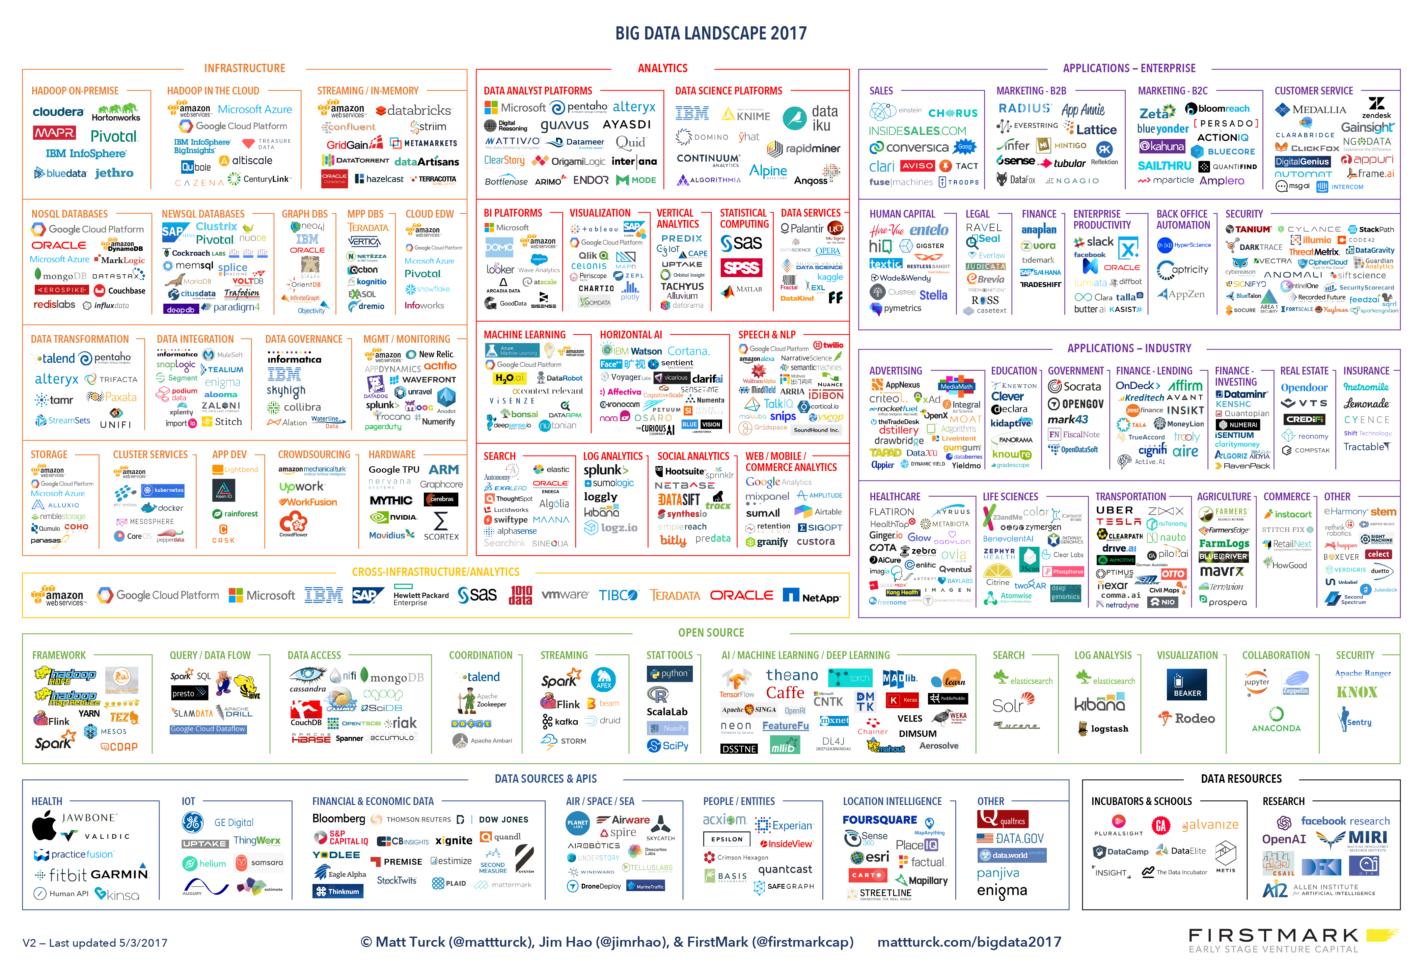 Big Data Spreadsheet For Firing On All Cylinders: The 2017 Big Data Landscape – Matt Turck